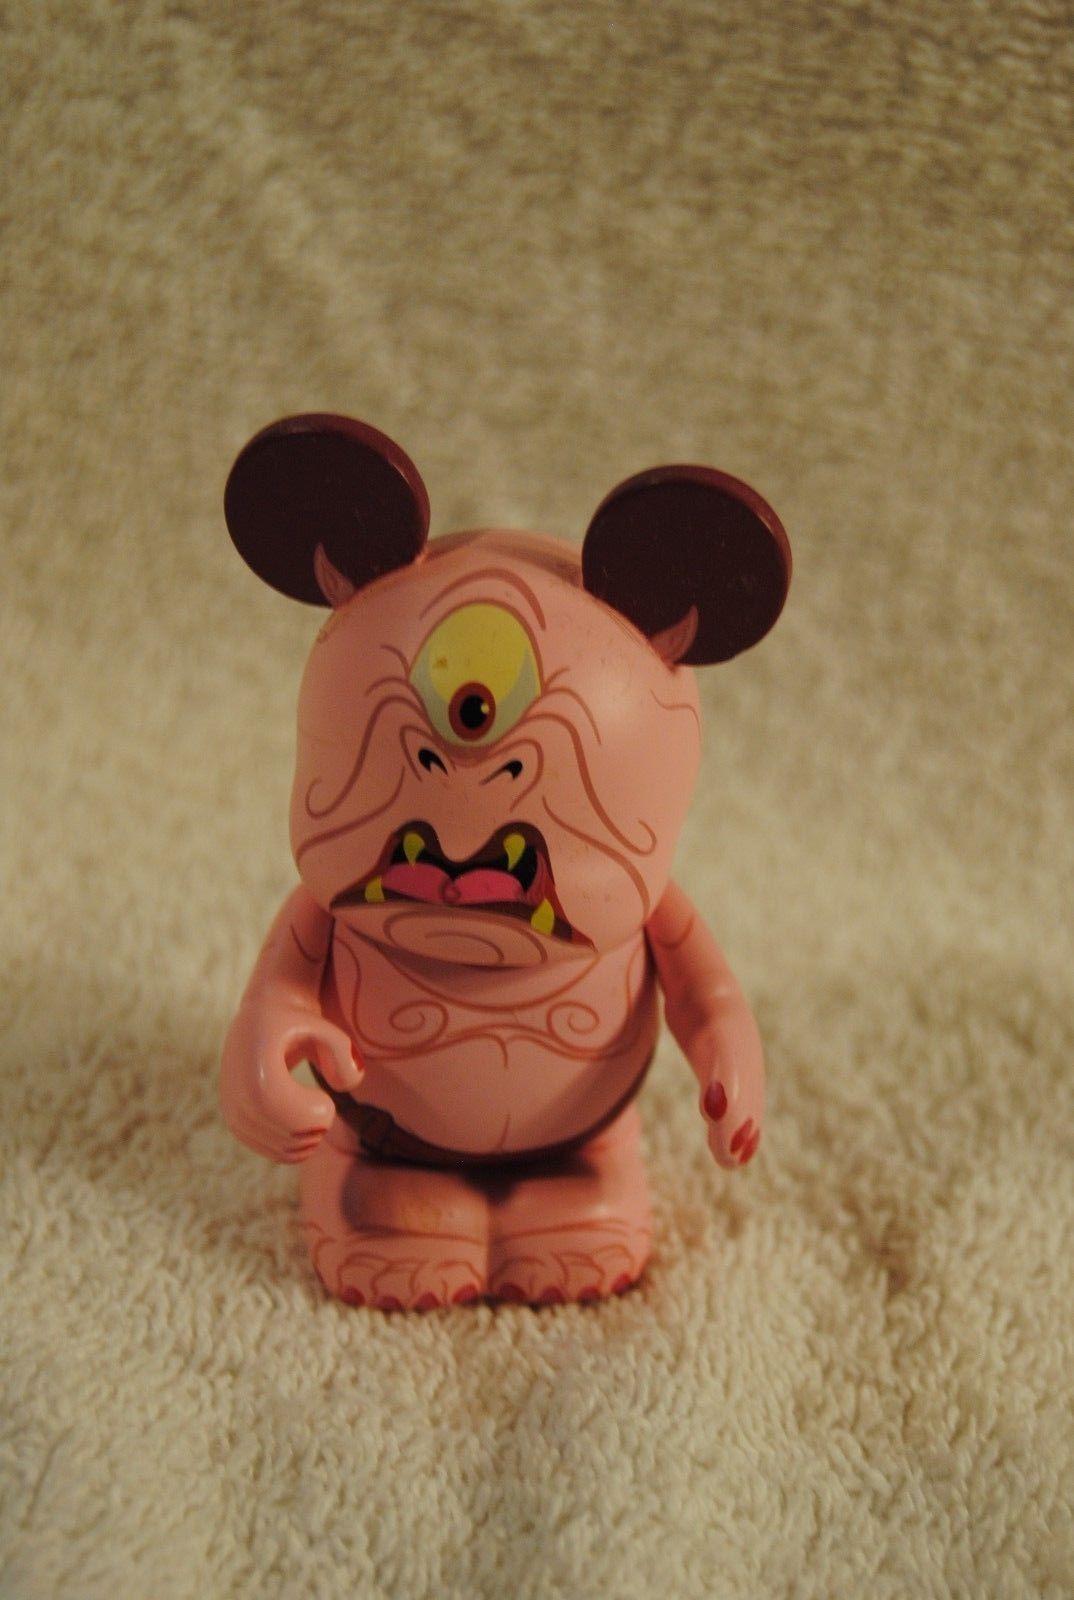 Disney Vinylmation Villains 4 Series Cyclops Mickey Mouse